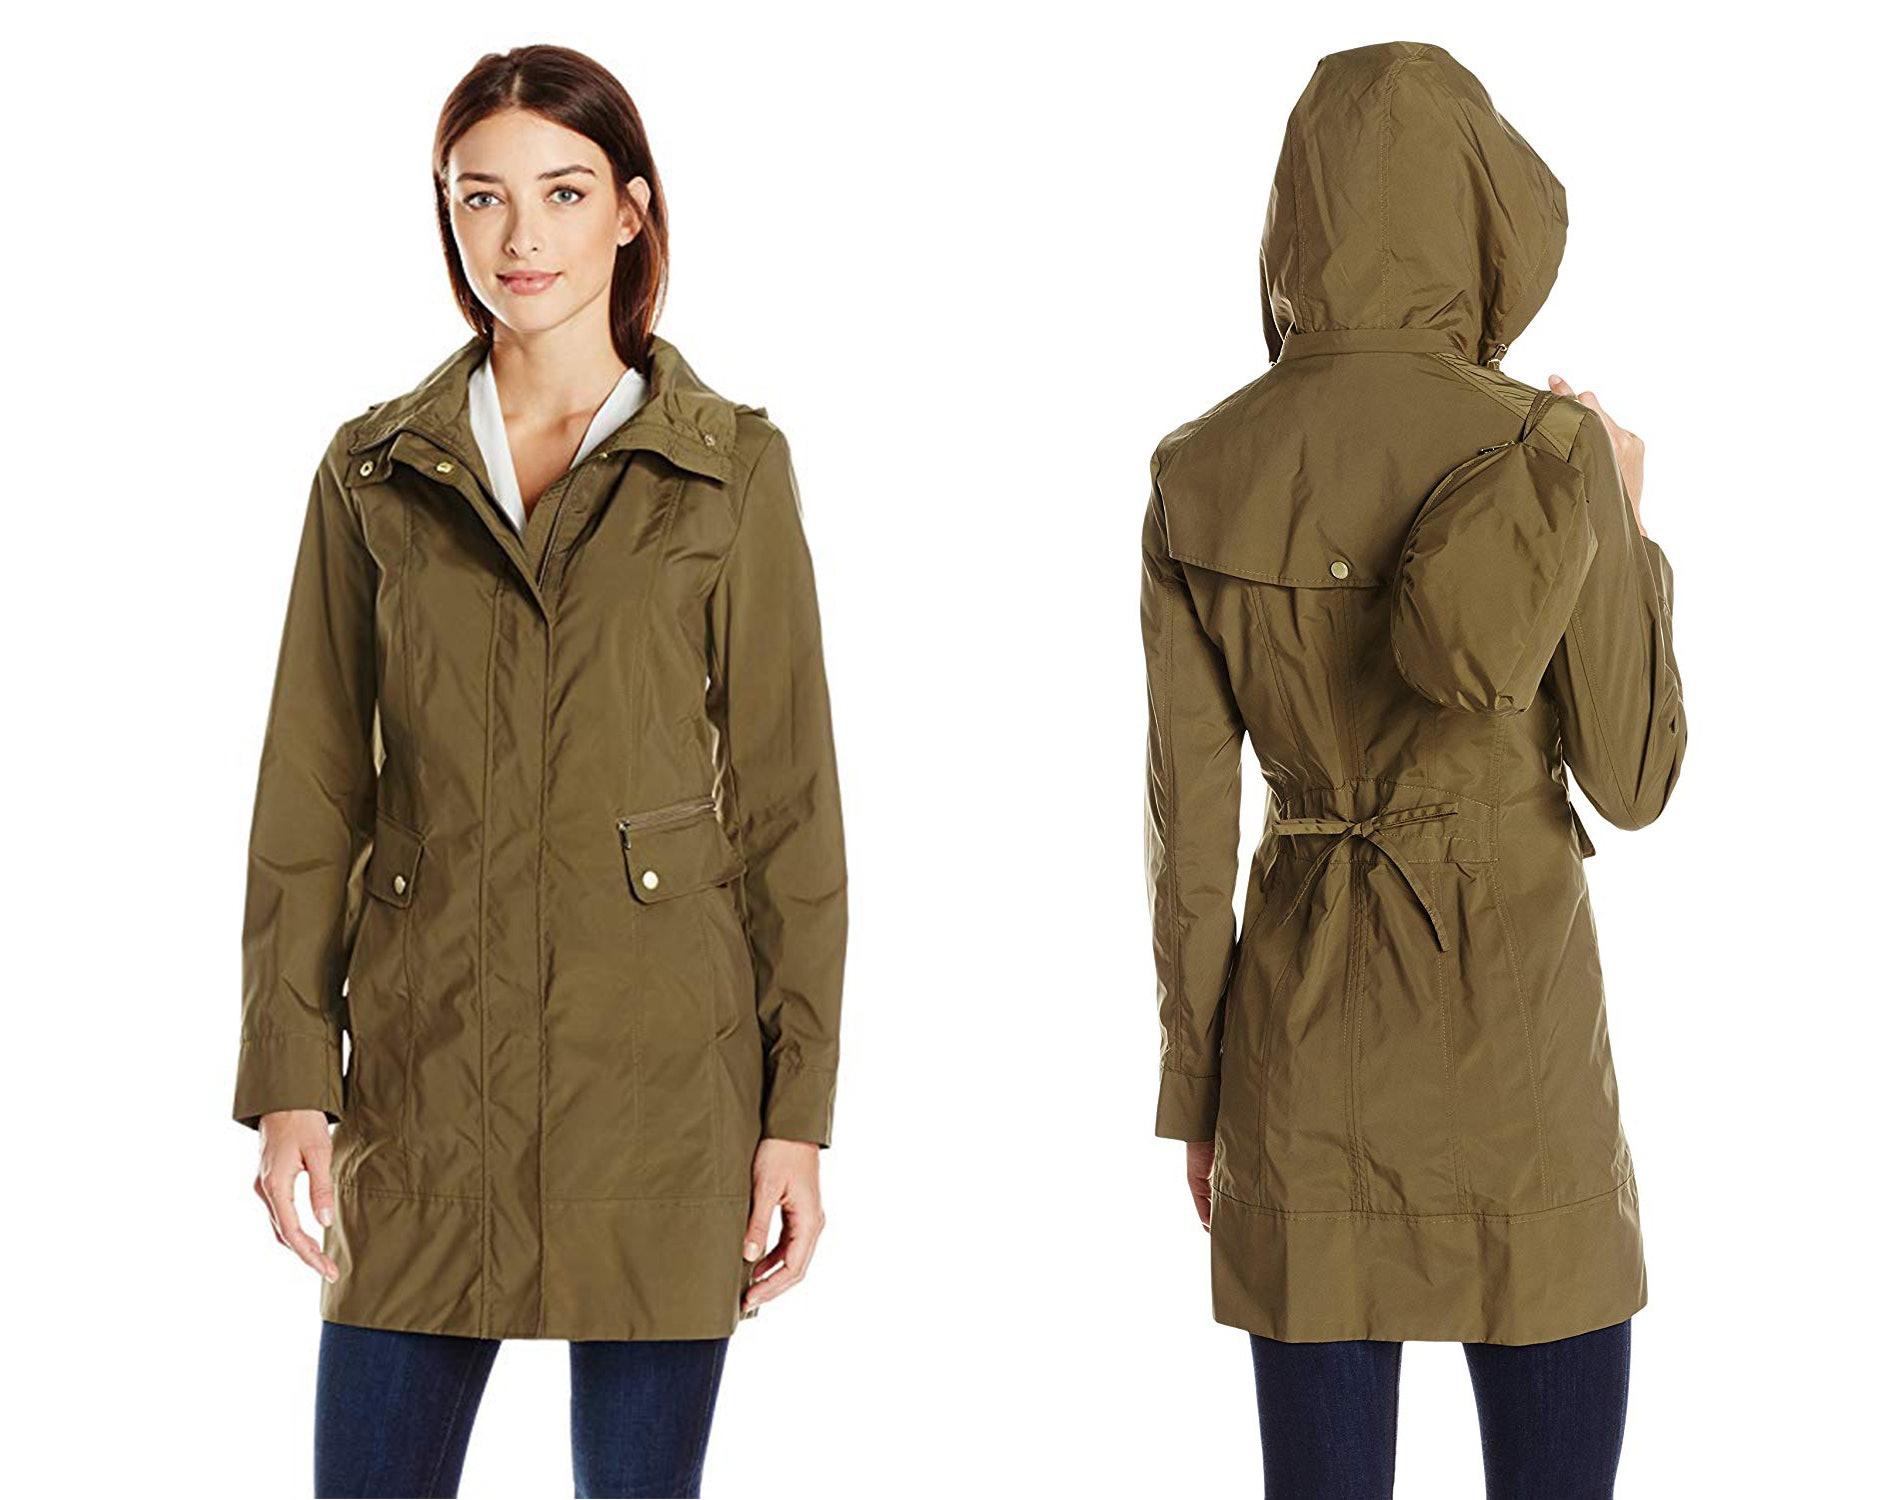 6 of the best lightweight raincoats forecast